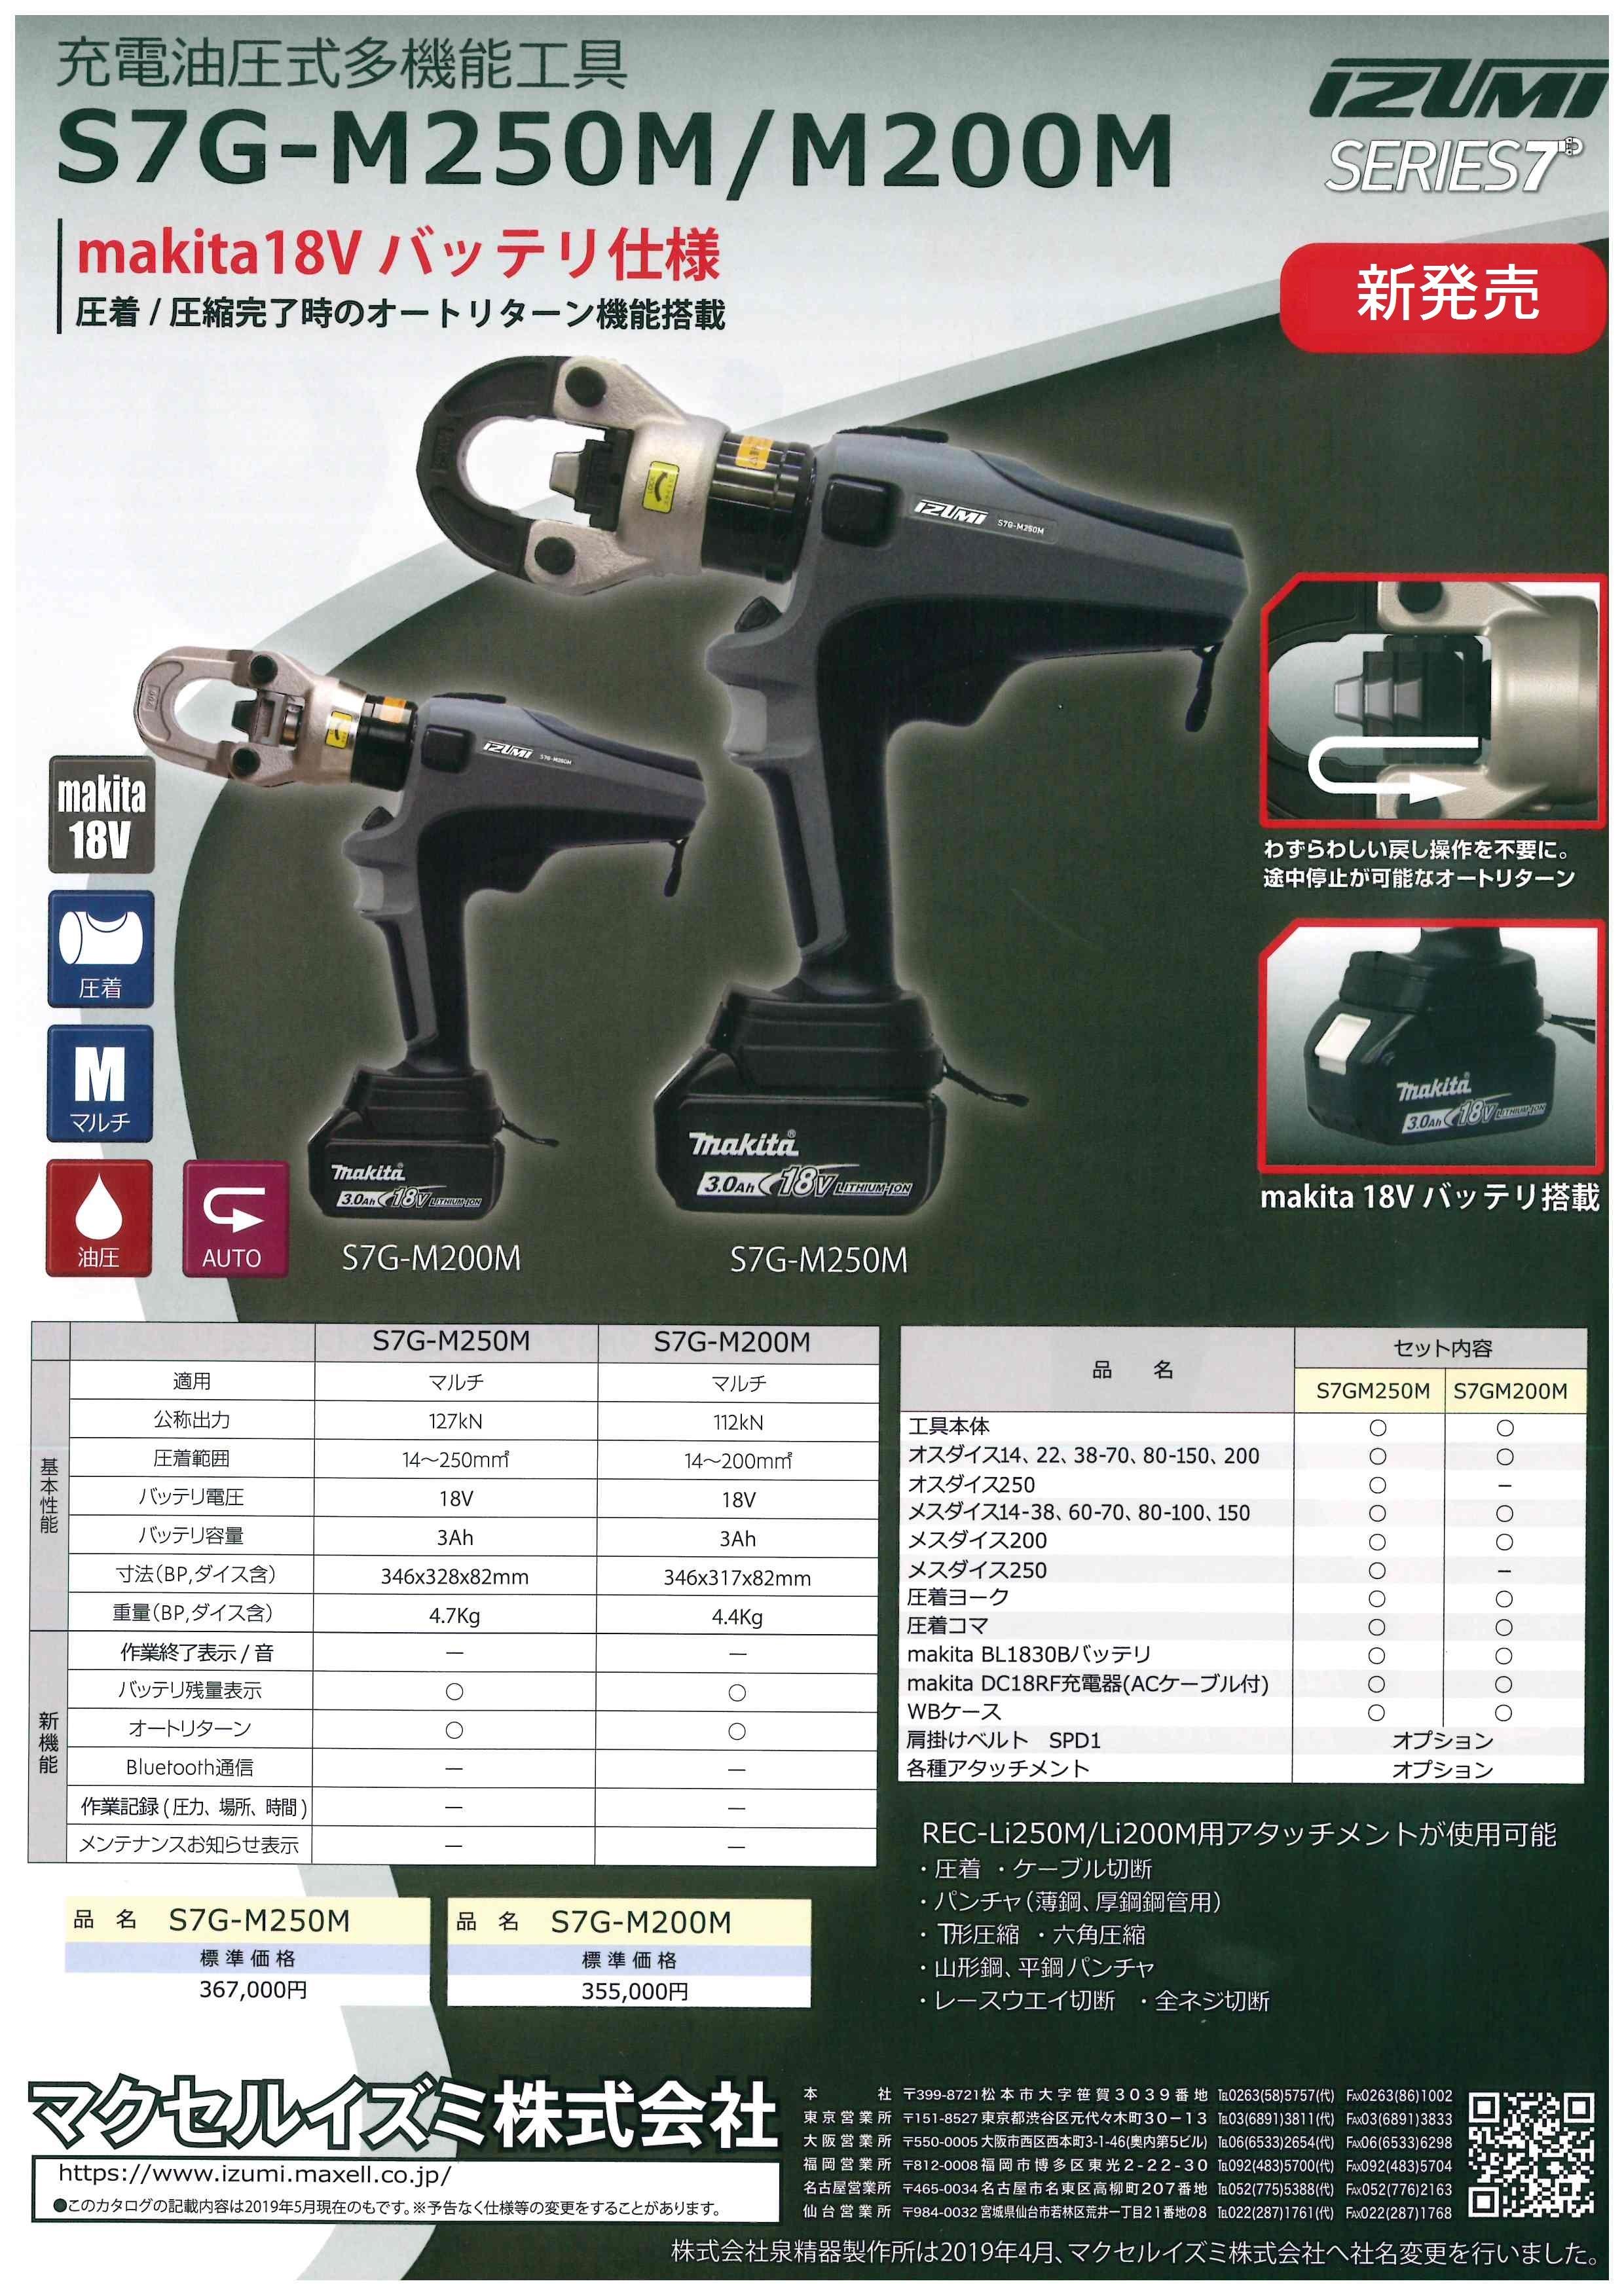 S7G-M200M チラシ